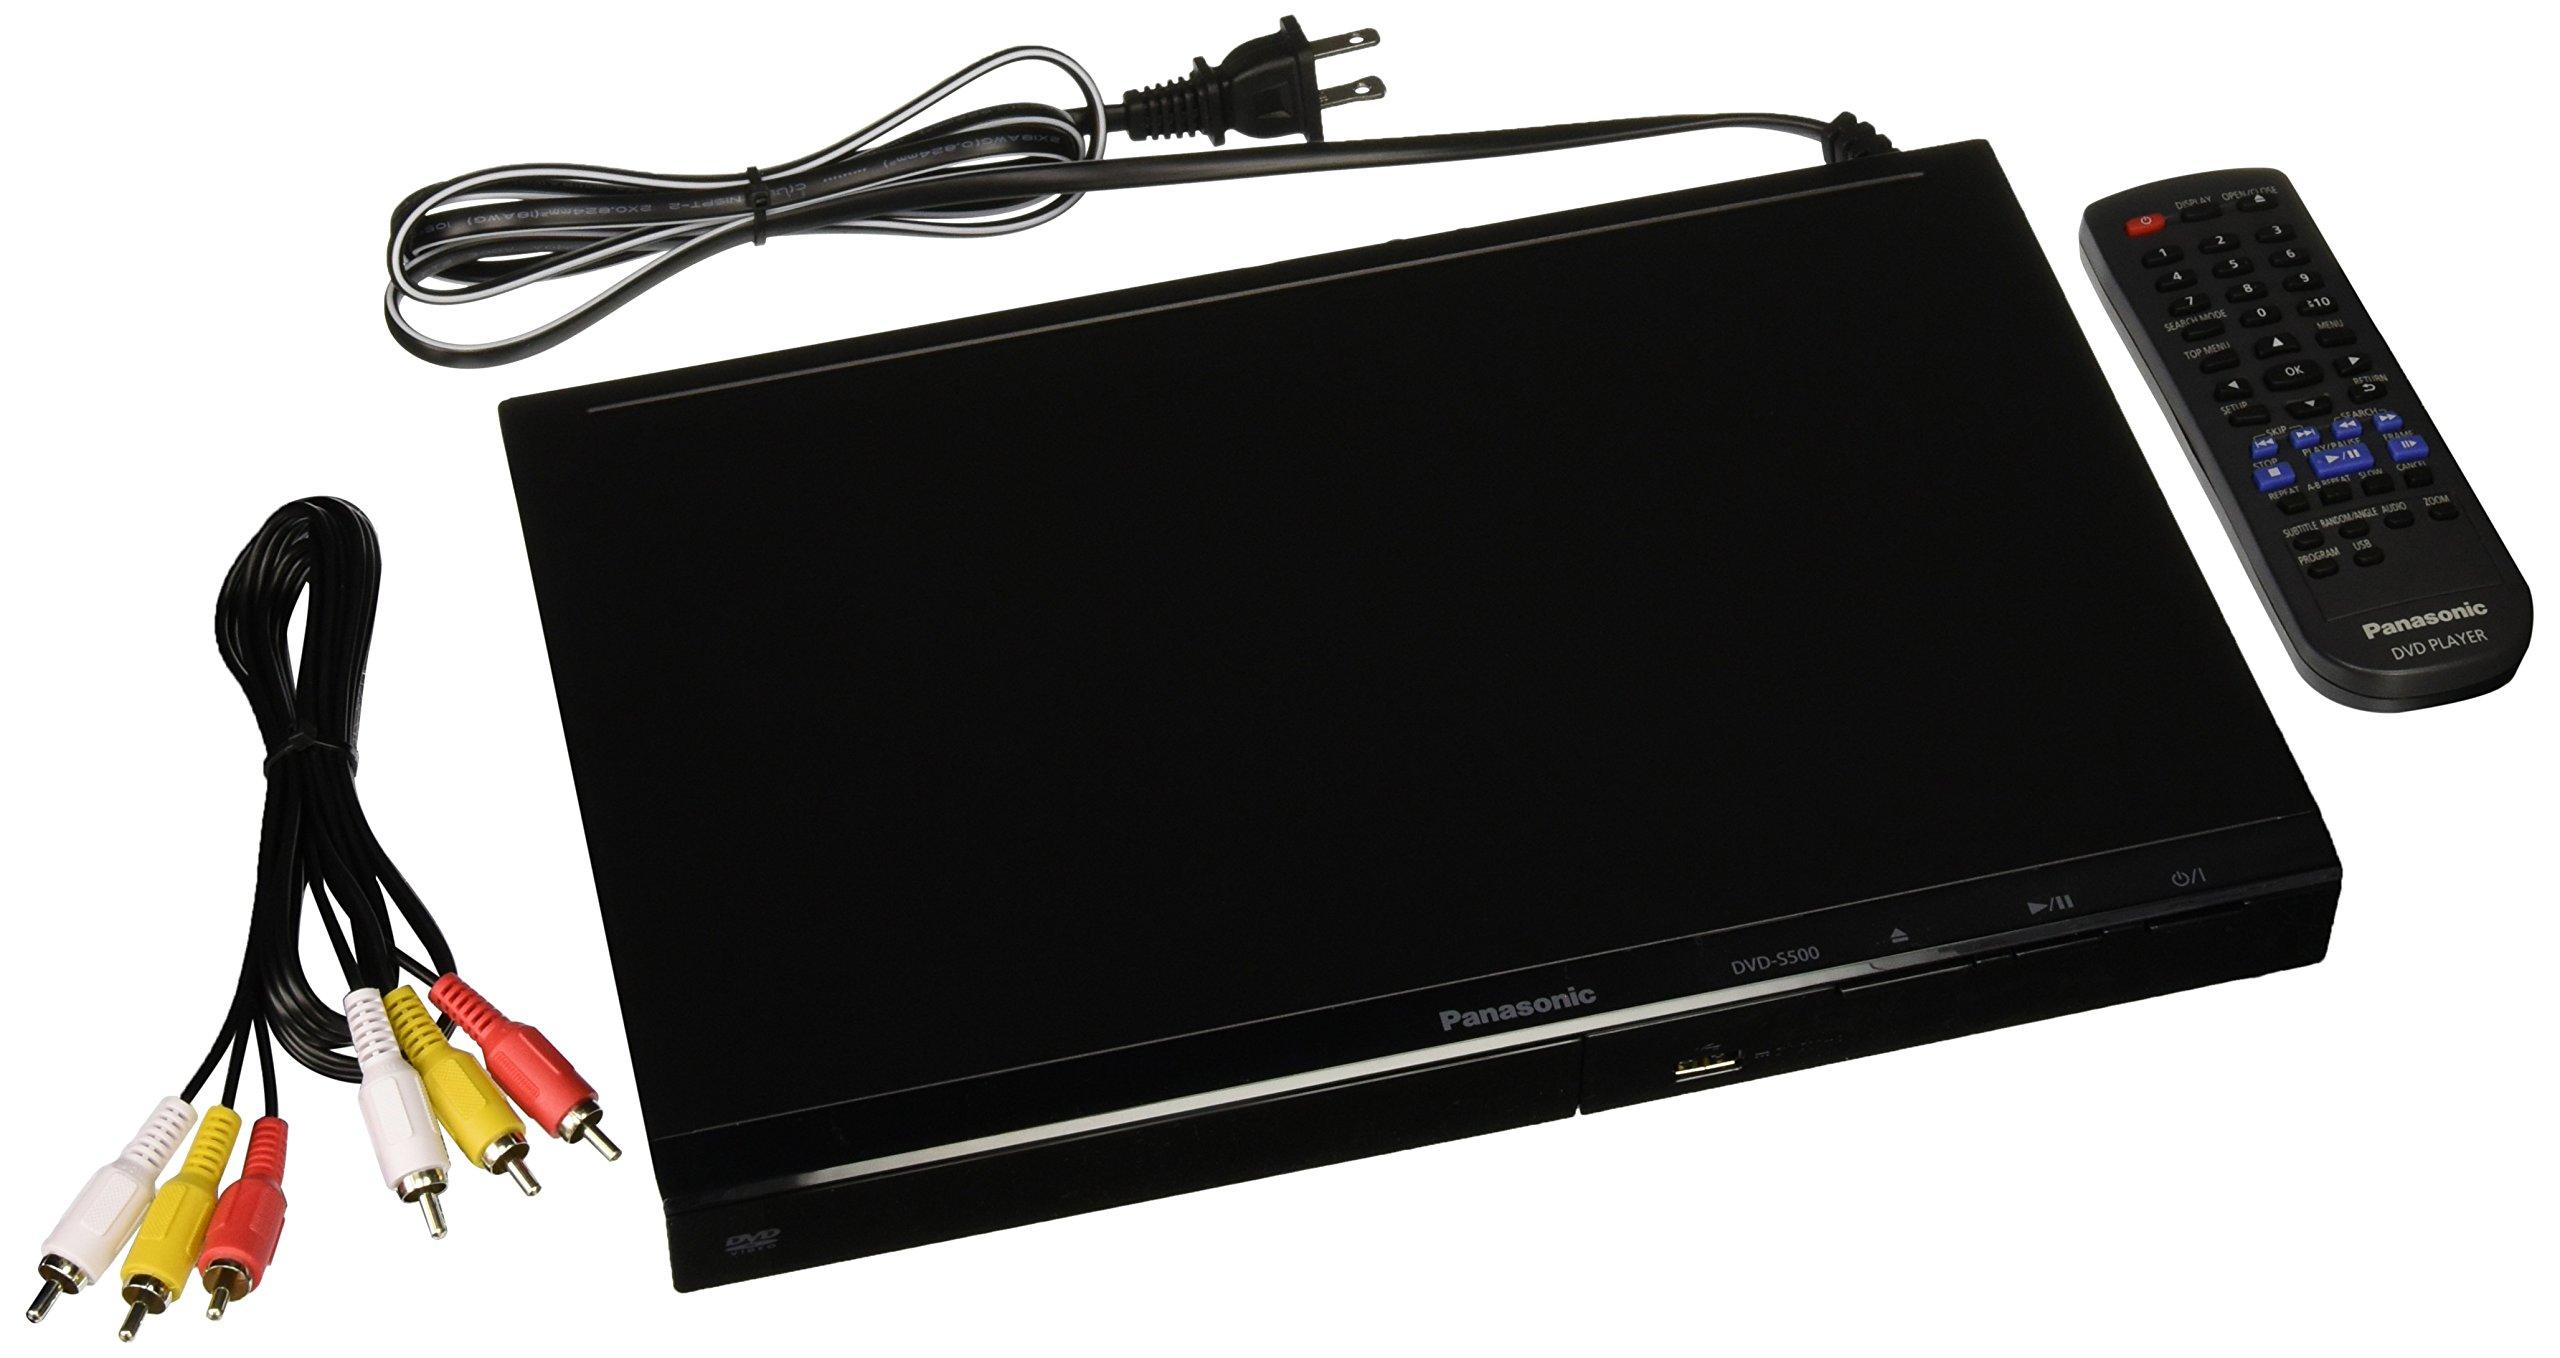 Panasonic DVD S500P K Multi Region Player